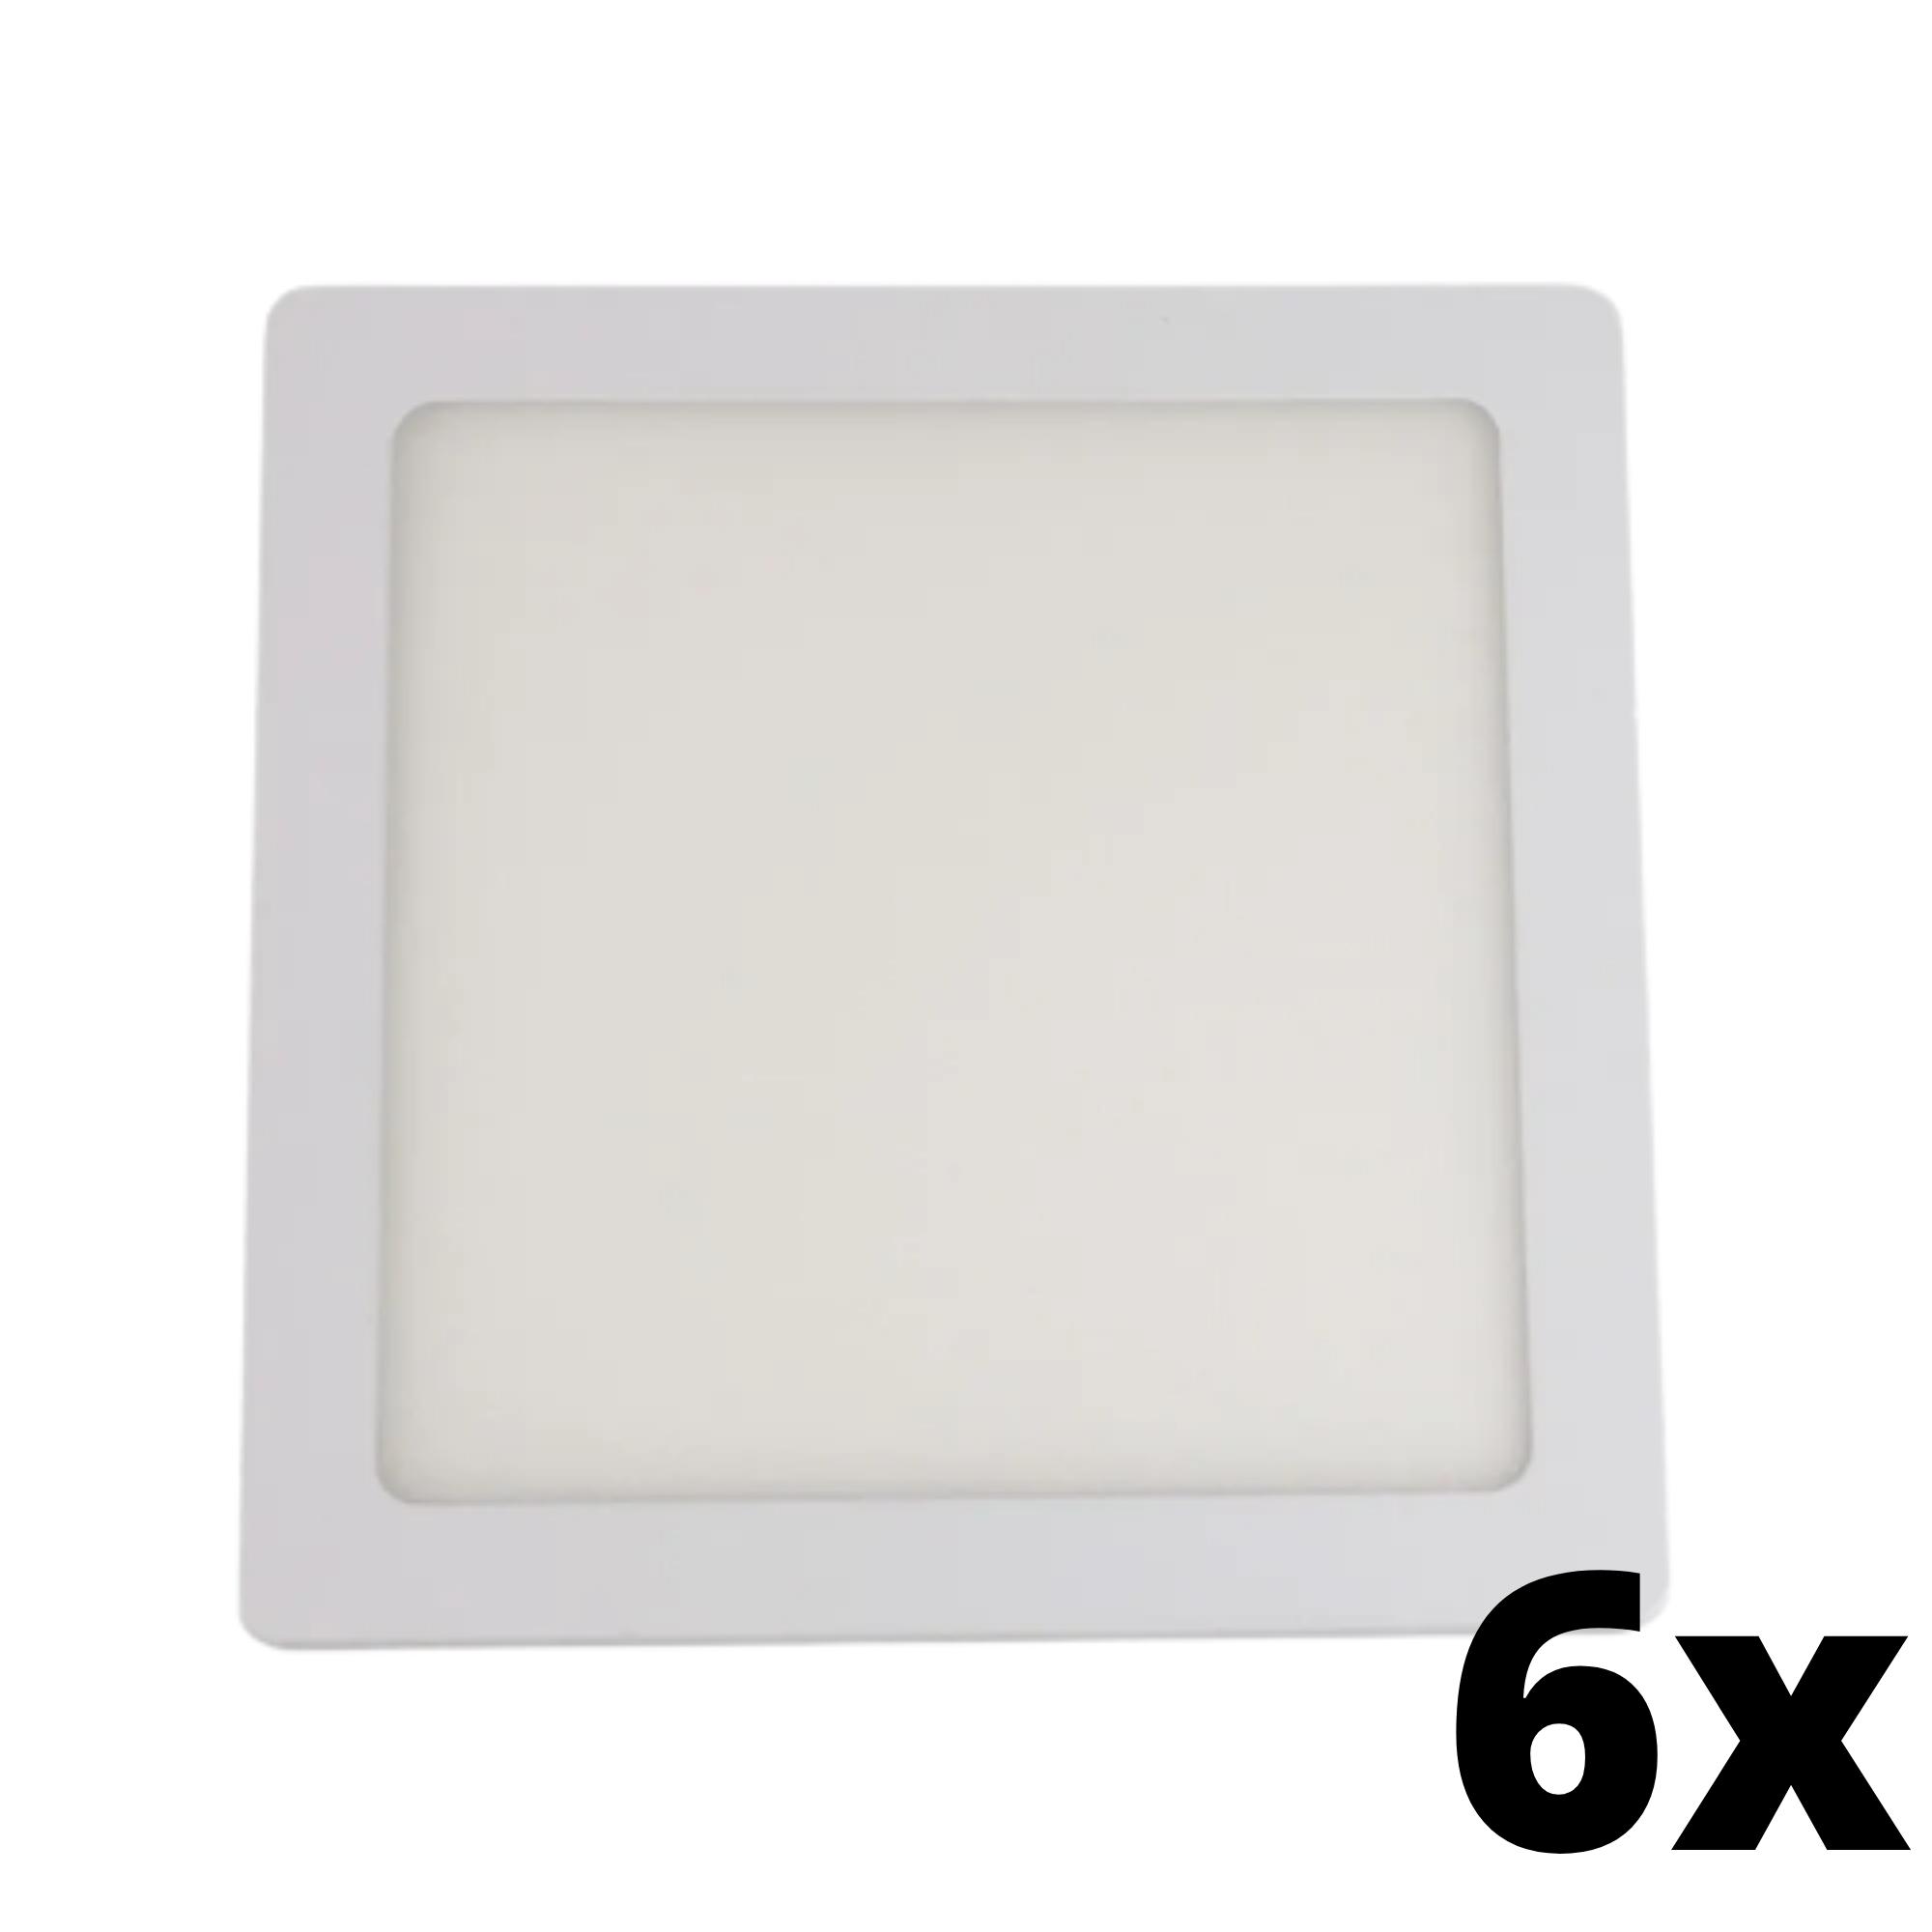 Kit 6 und Painel de Led Embutir 12w Quadrado 3000k